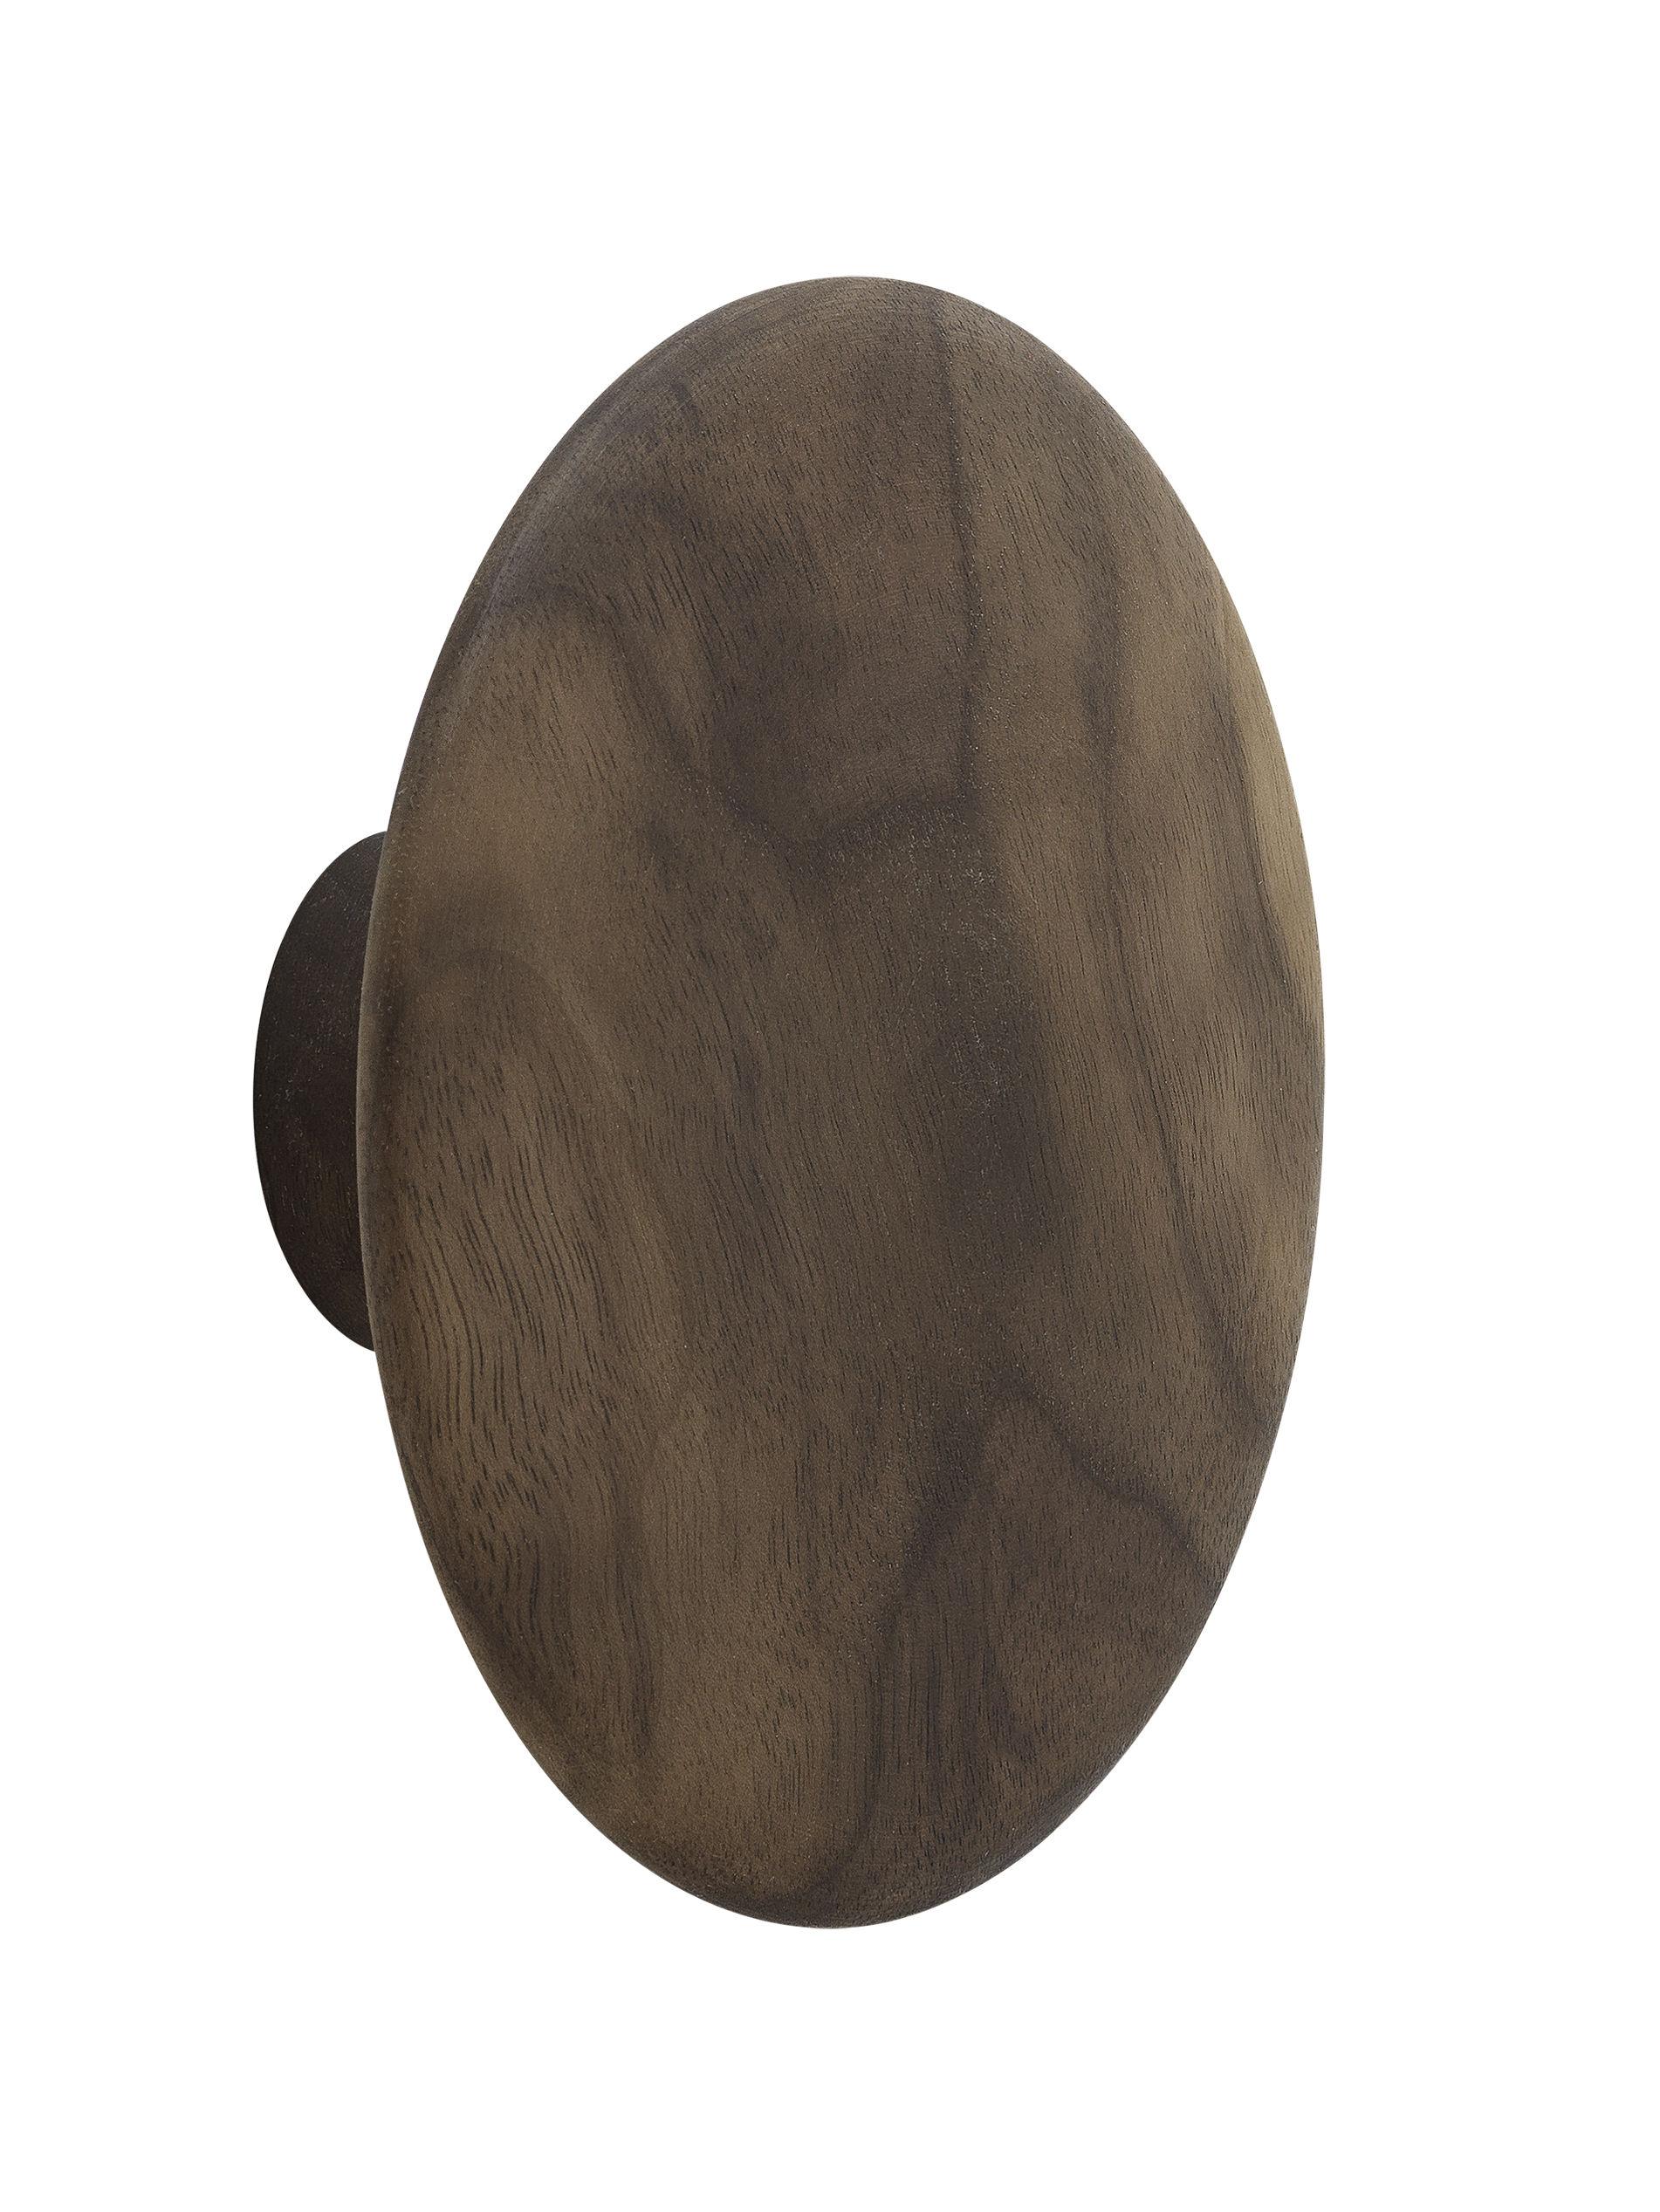 Decoration - Coat Stands & Hooks - The Dots Wood Hook - / Medium - Ø 13 cm by Muuto - Natural walnut - Natural walnut